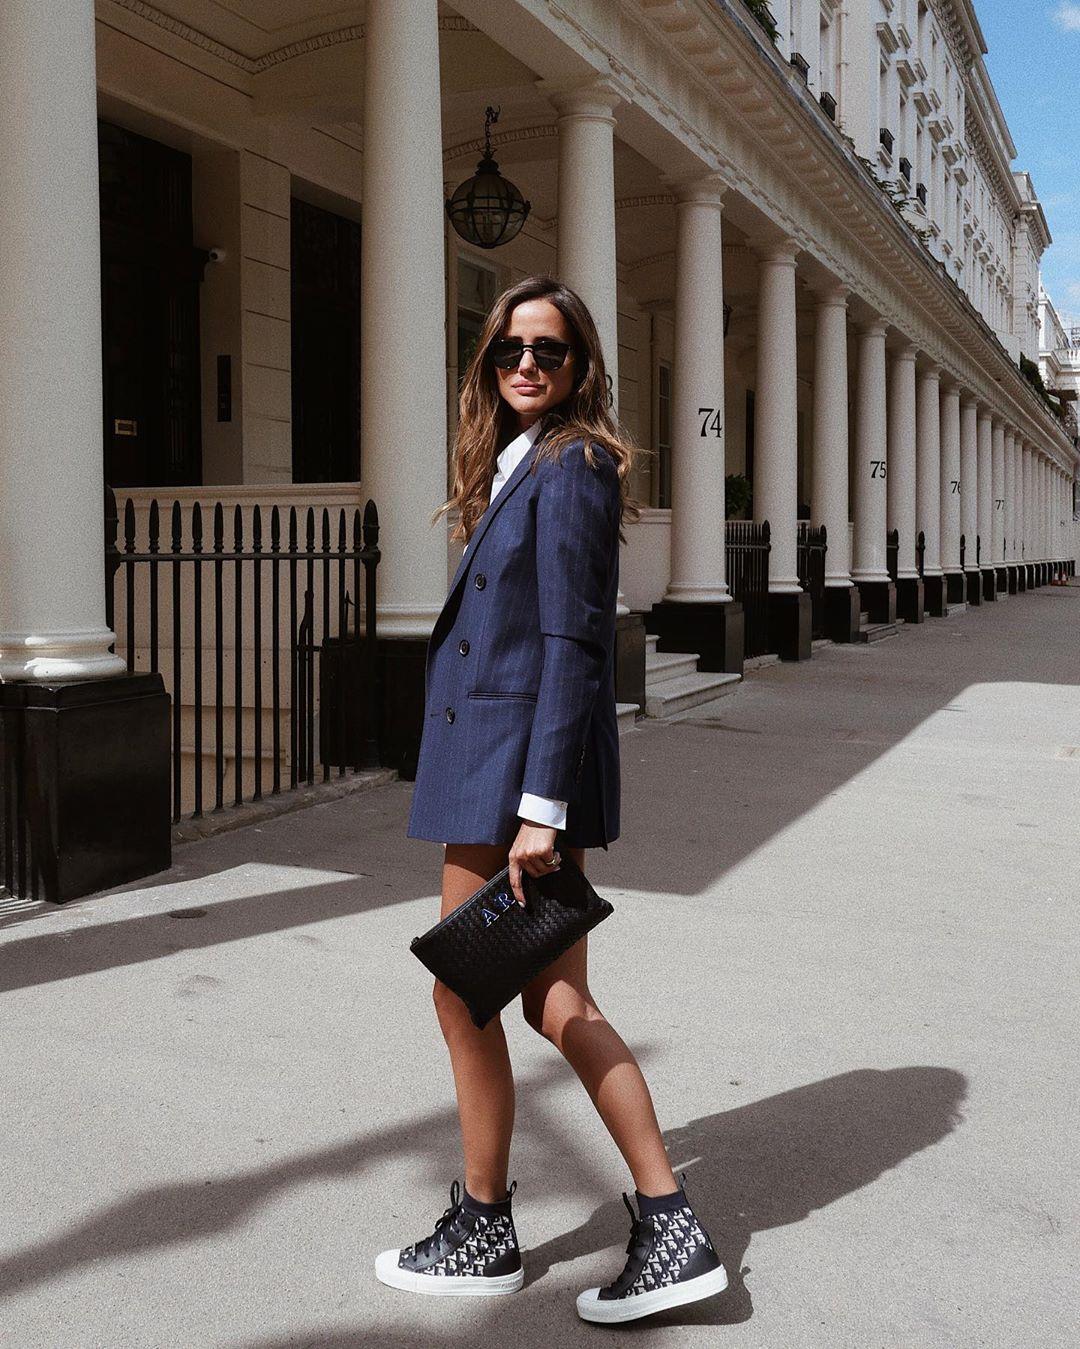 suit jacket 100% merino wool stripes tennis slim fit de massimo dutti sur ariviere